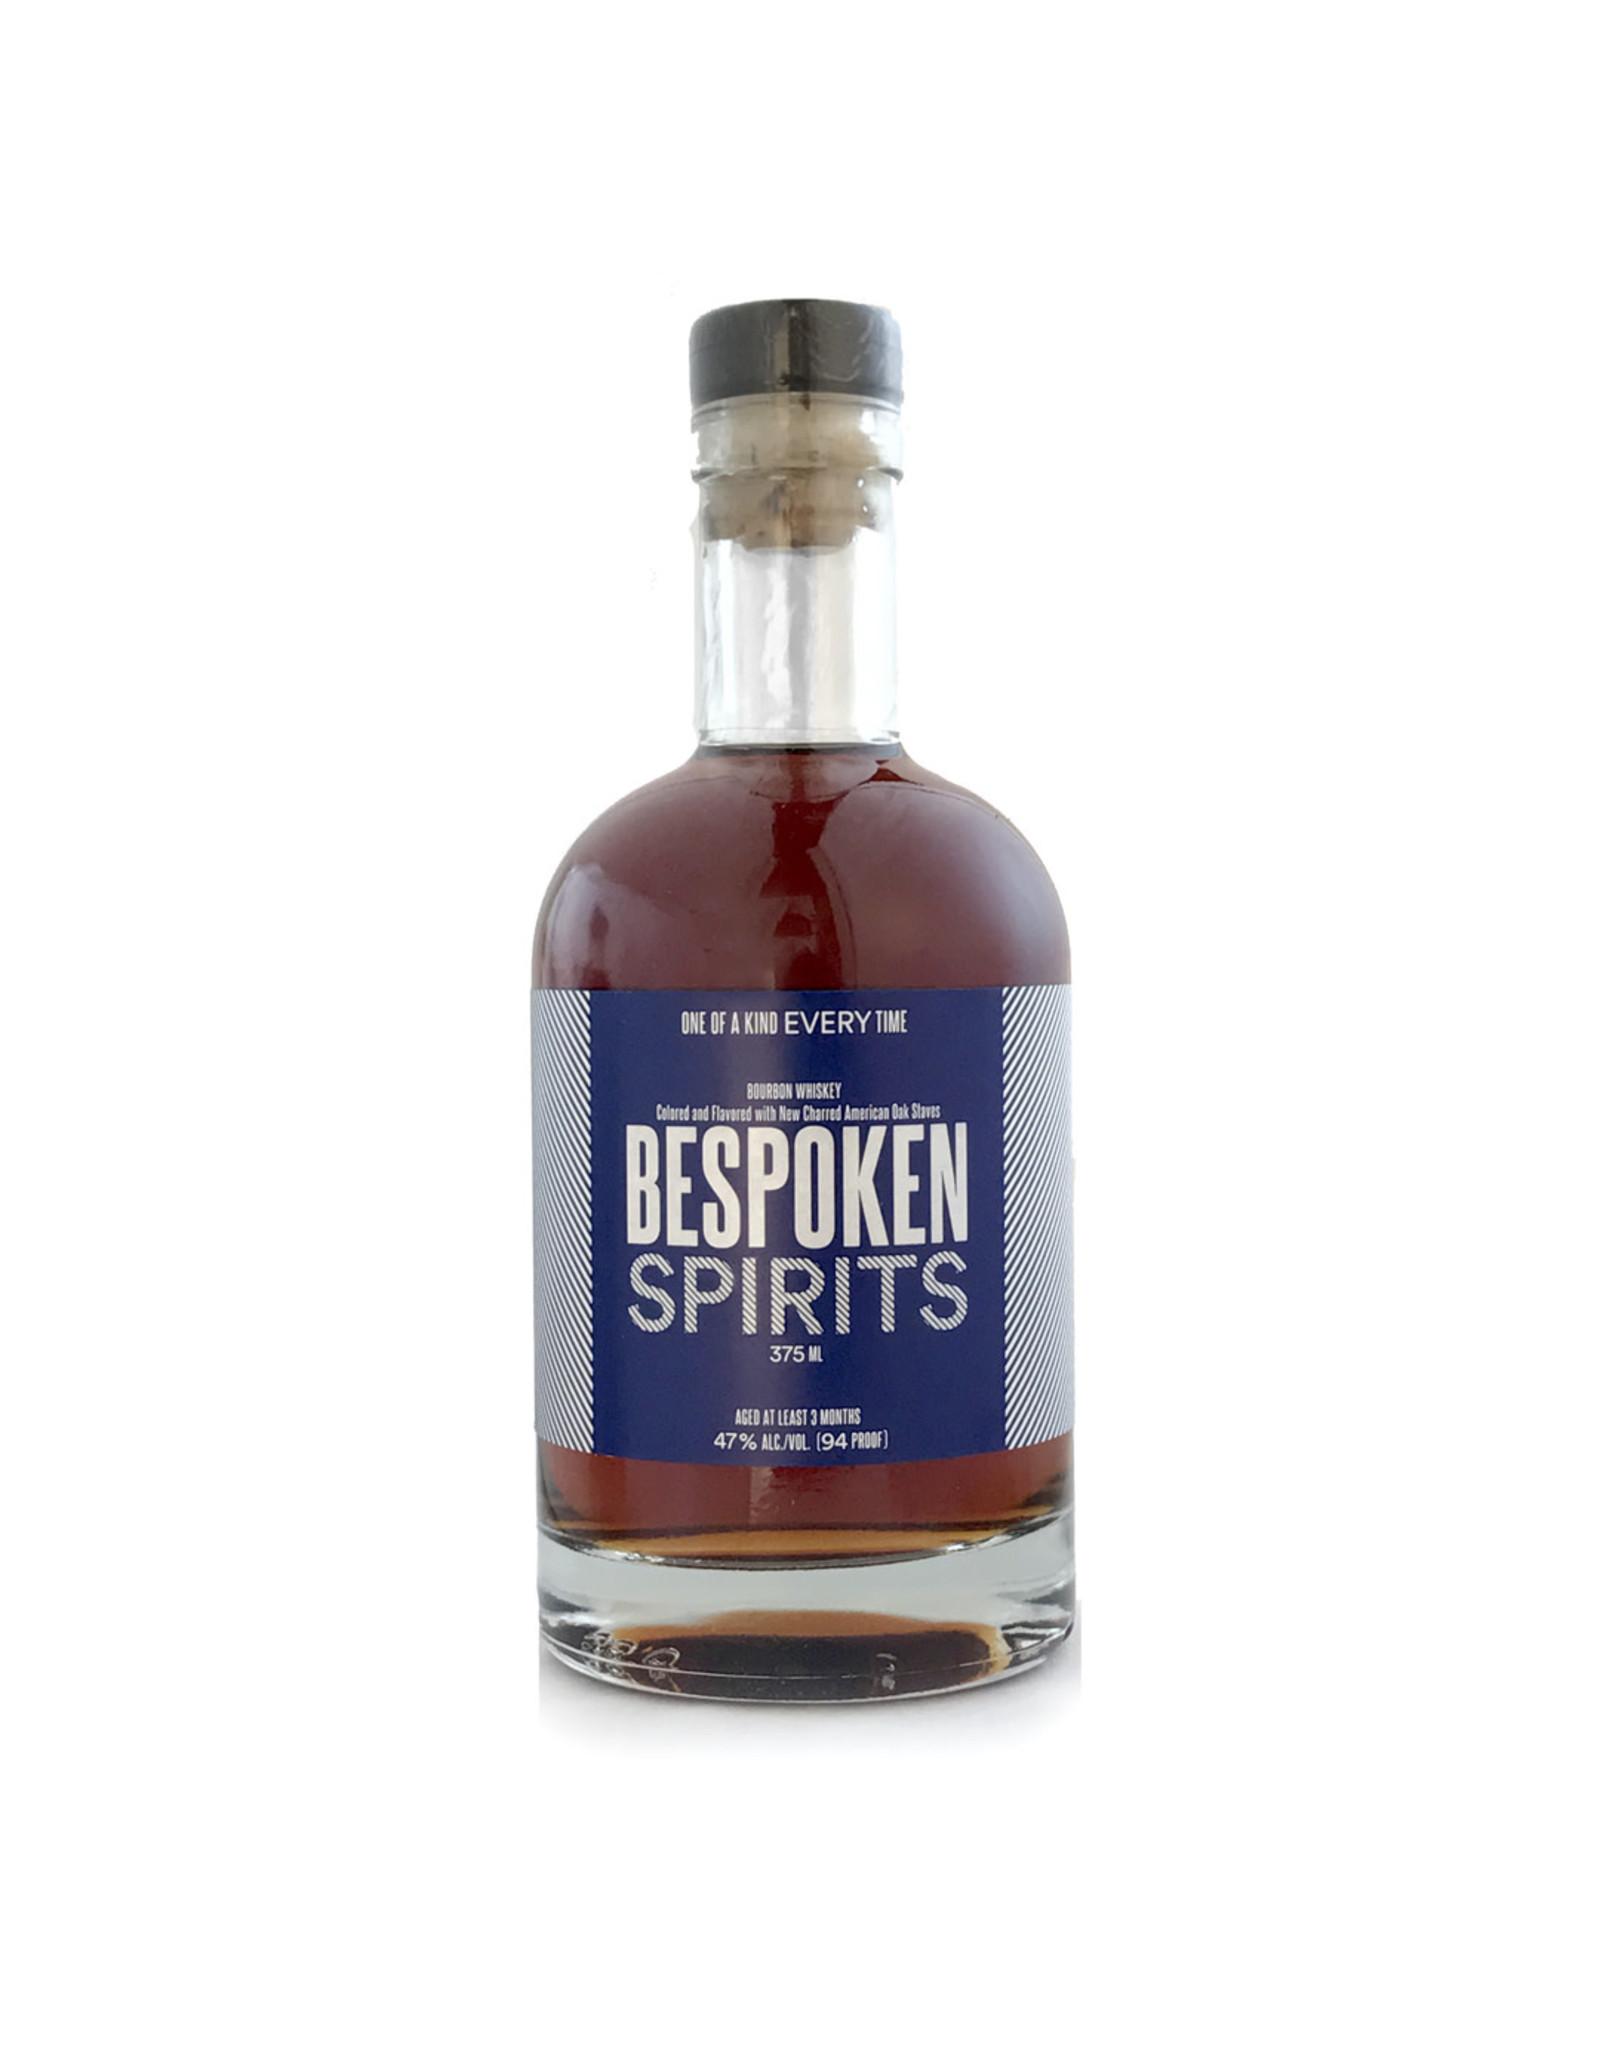 Bespoken Spirits Bourbon Whiskey  375ml (Blue Label)